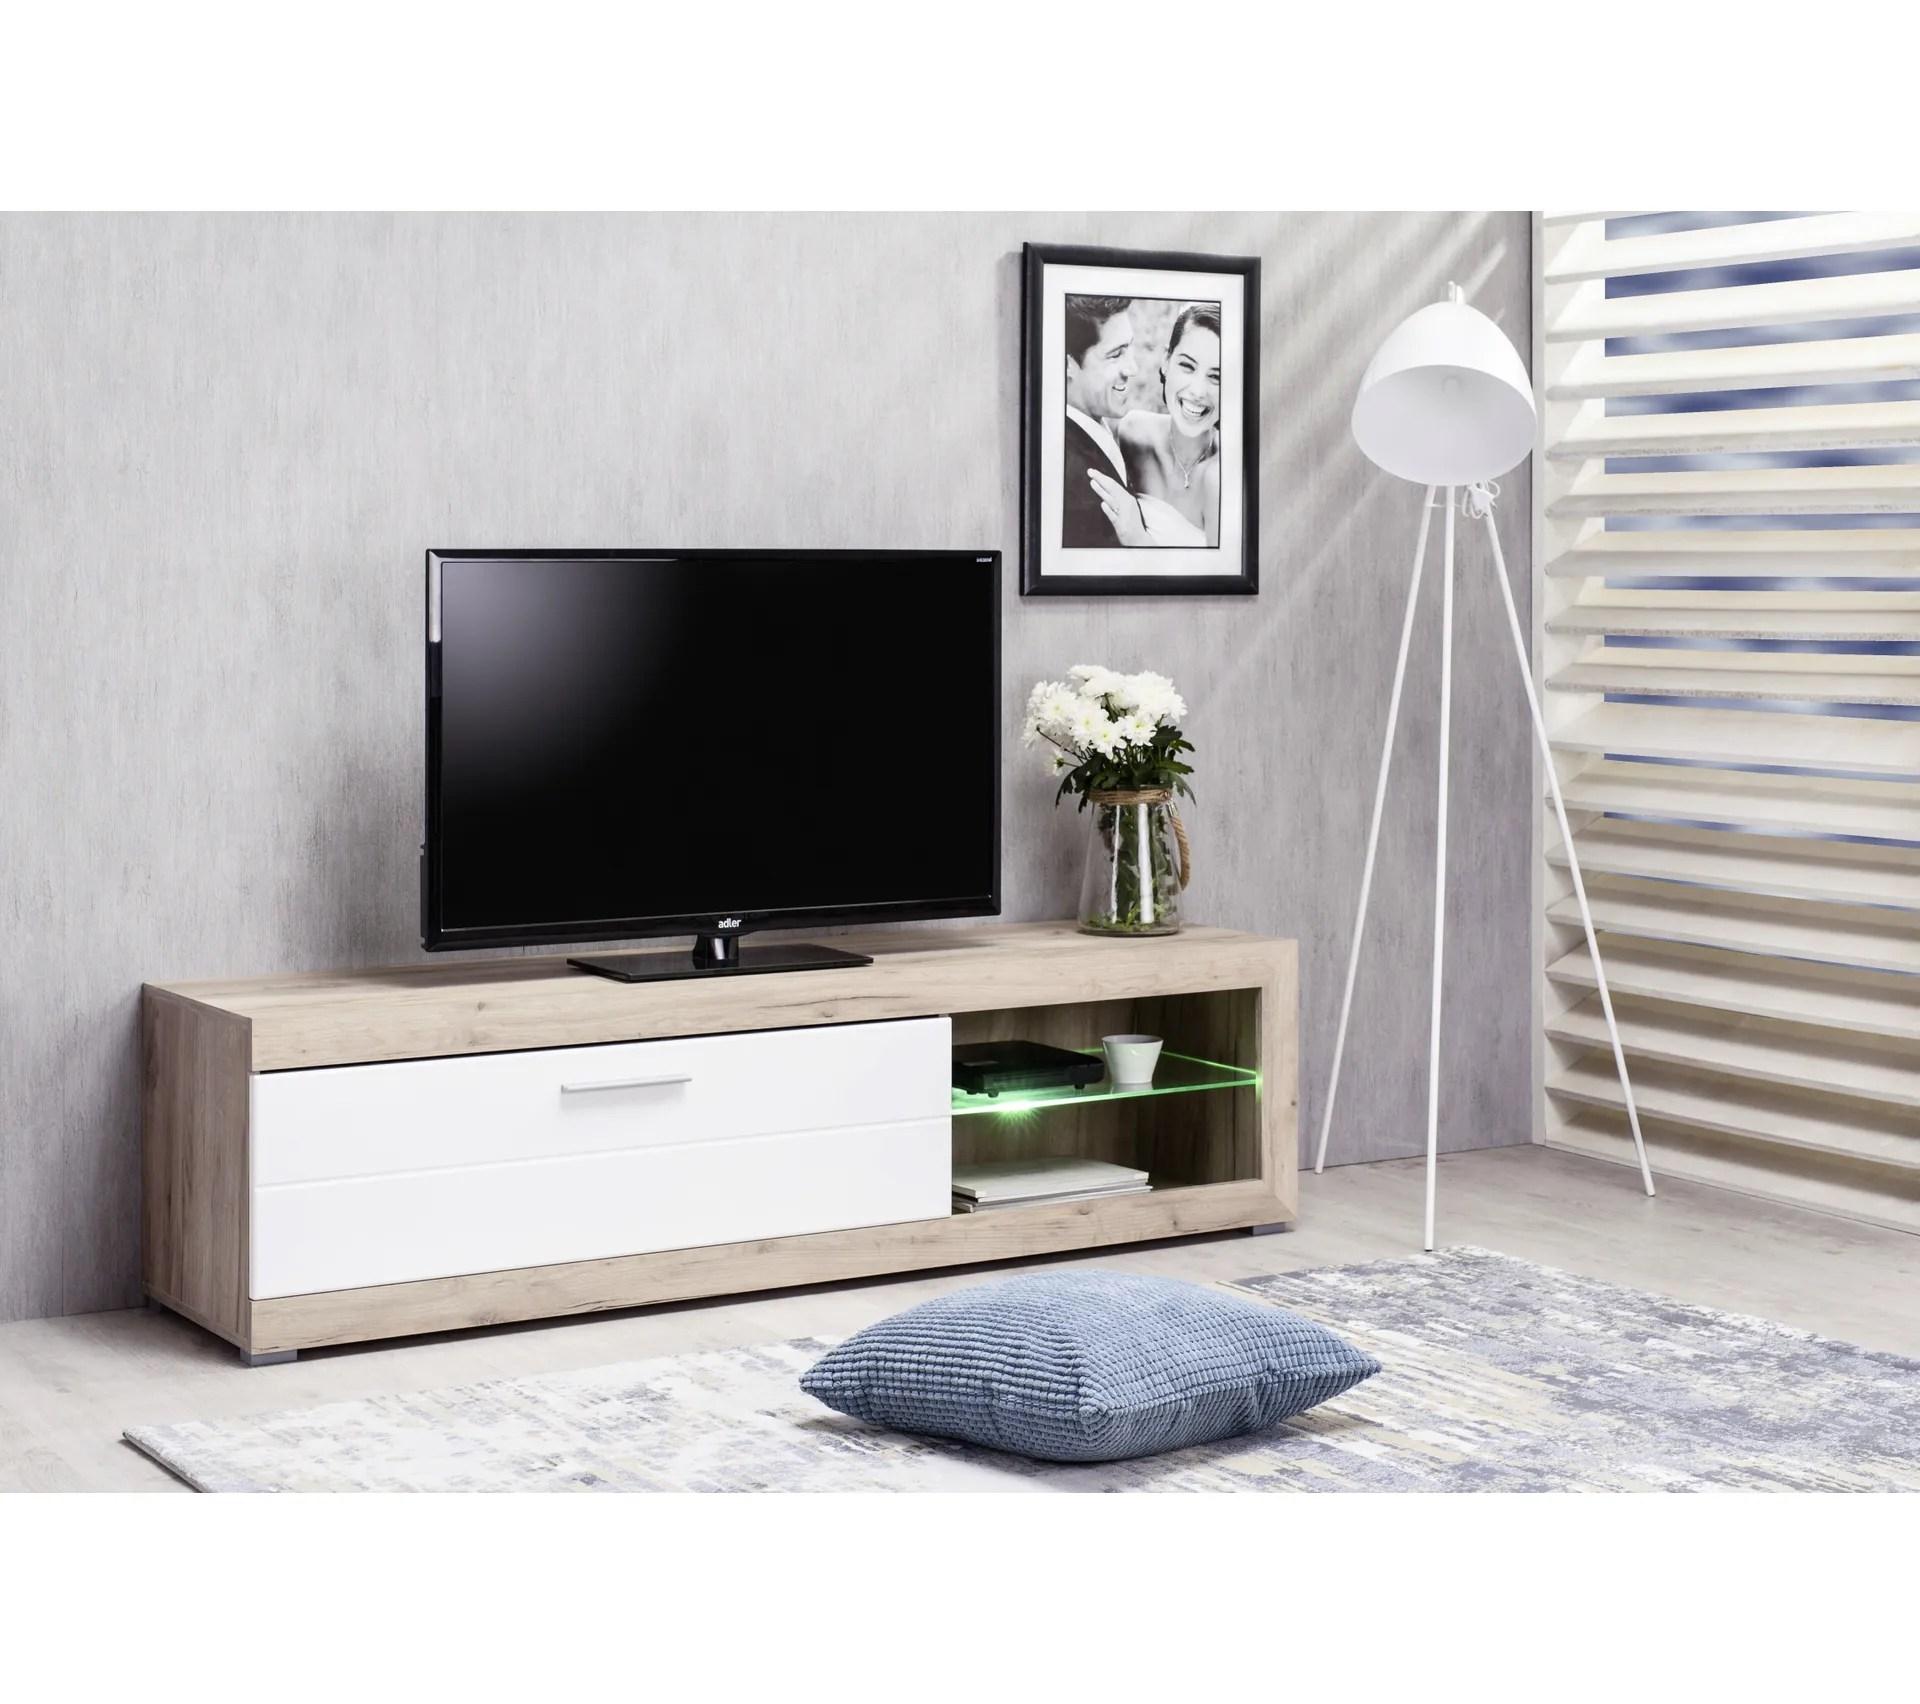 meuble tv remo imitation chene gris blanc